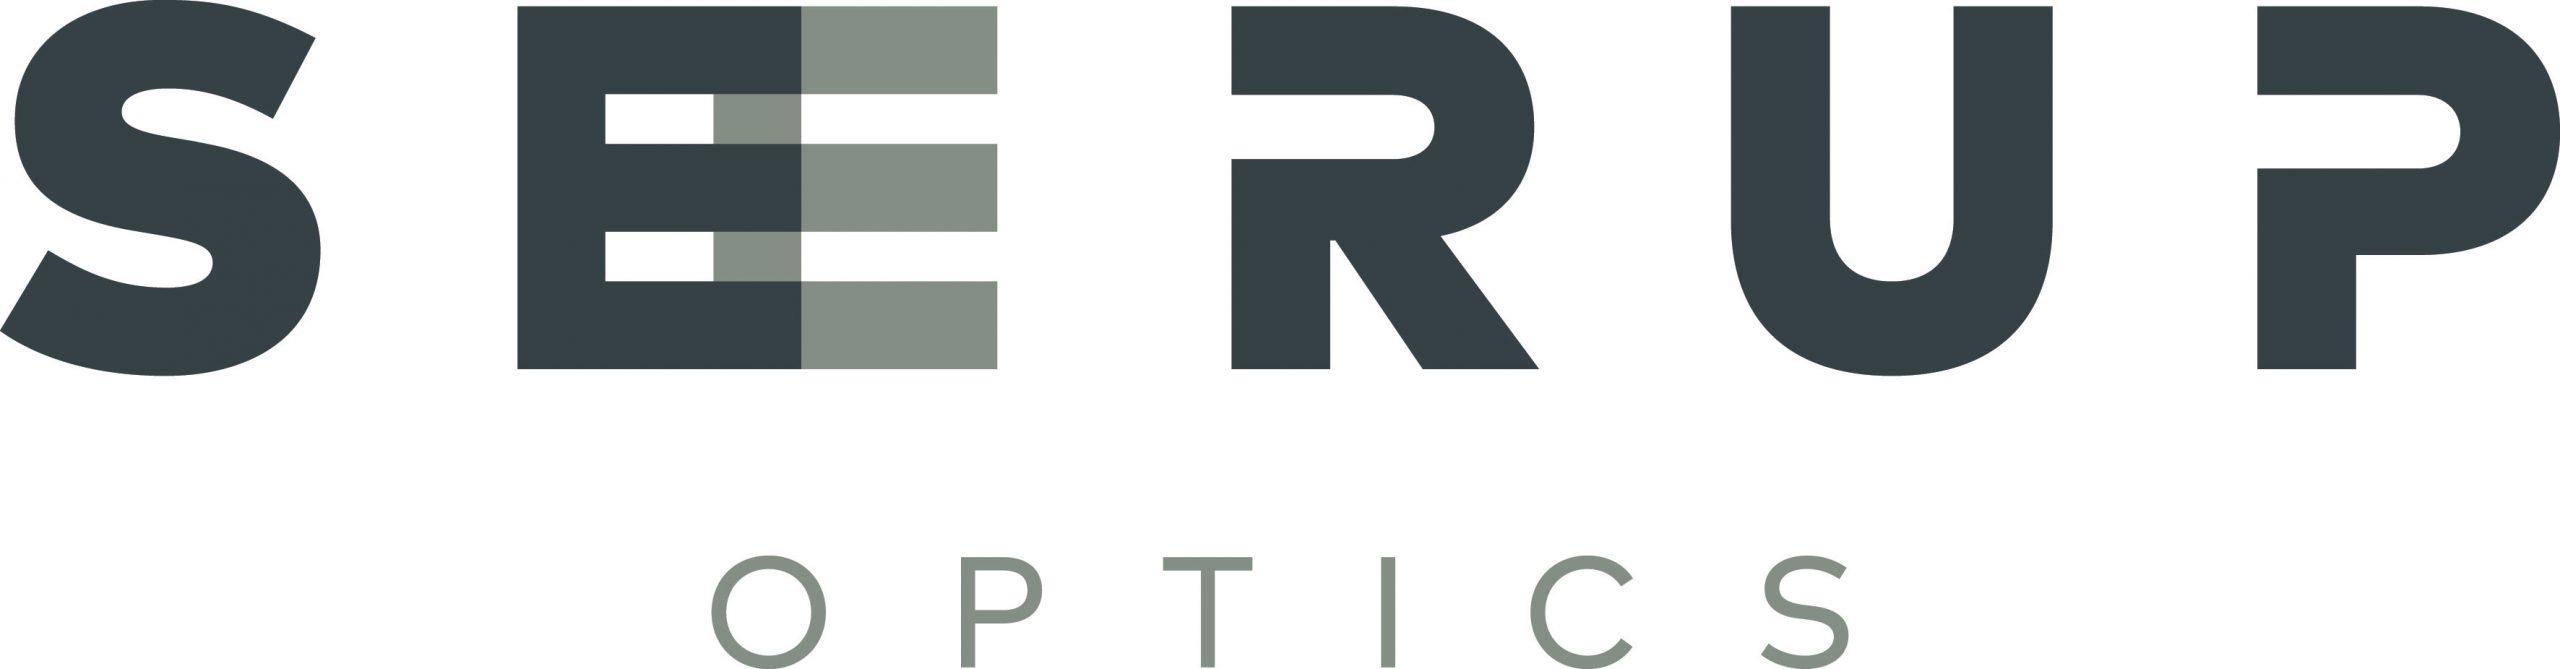 Seerup Optics_logo